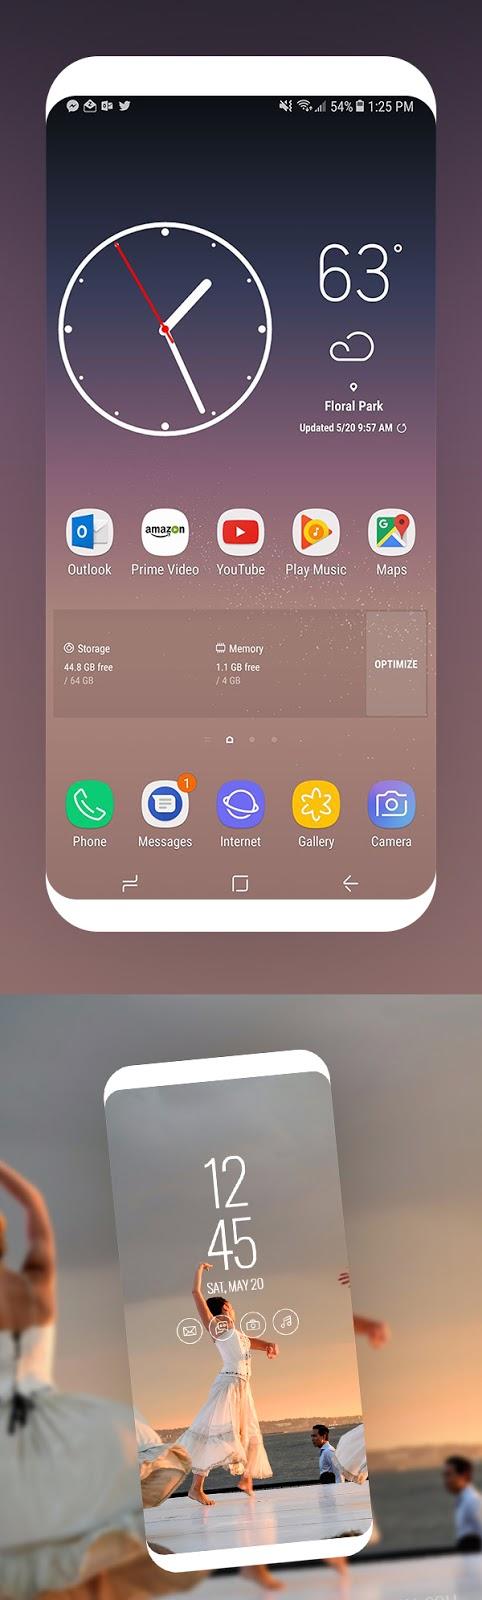 Download Free Mockup PSD 2018 - Free Samsung Galaxy S8 Screen Mockup Design